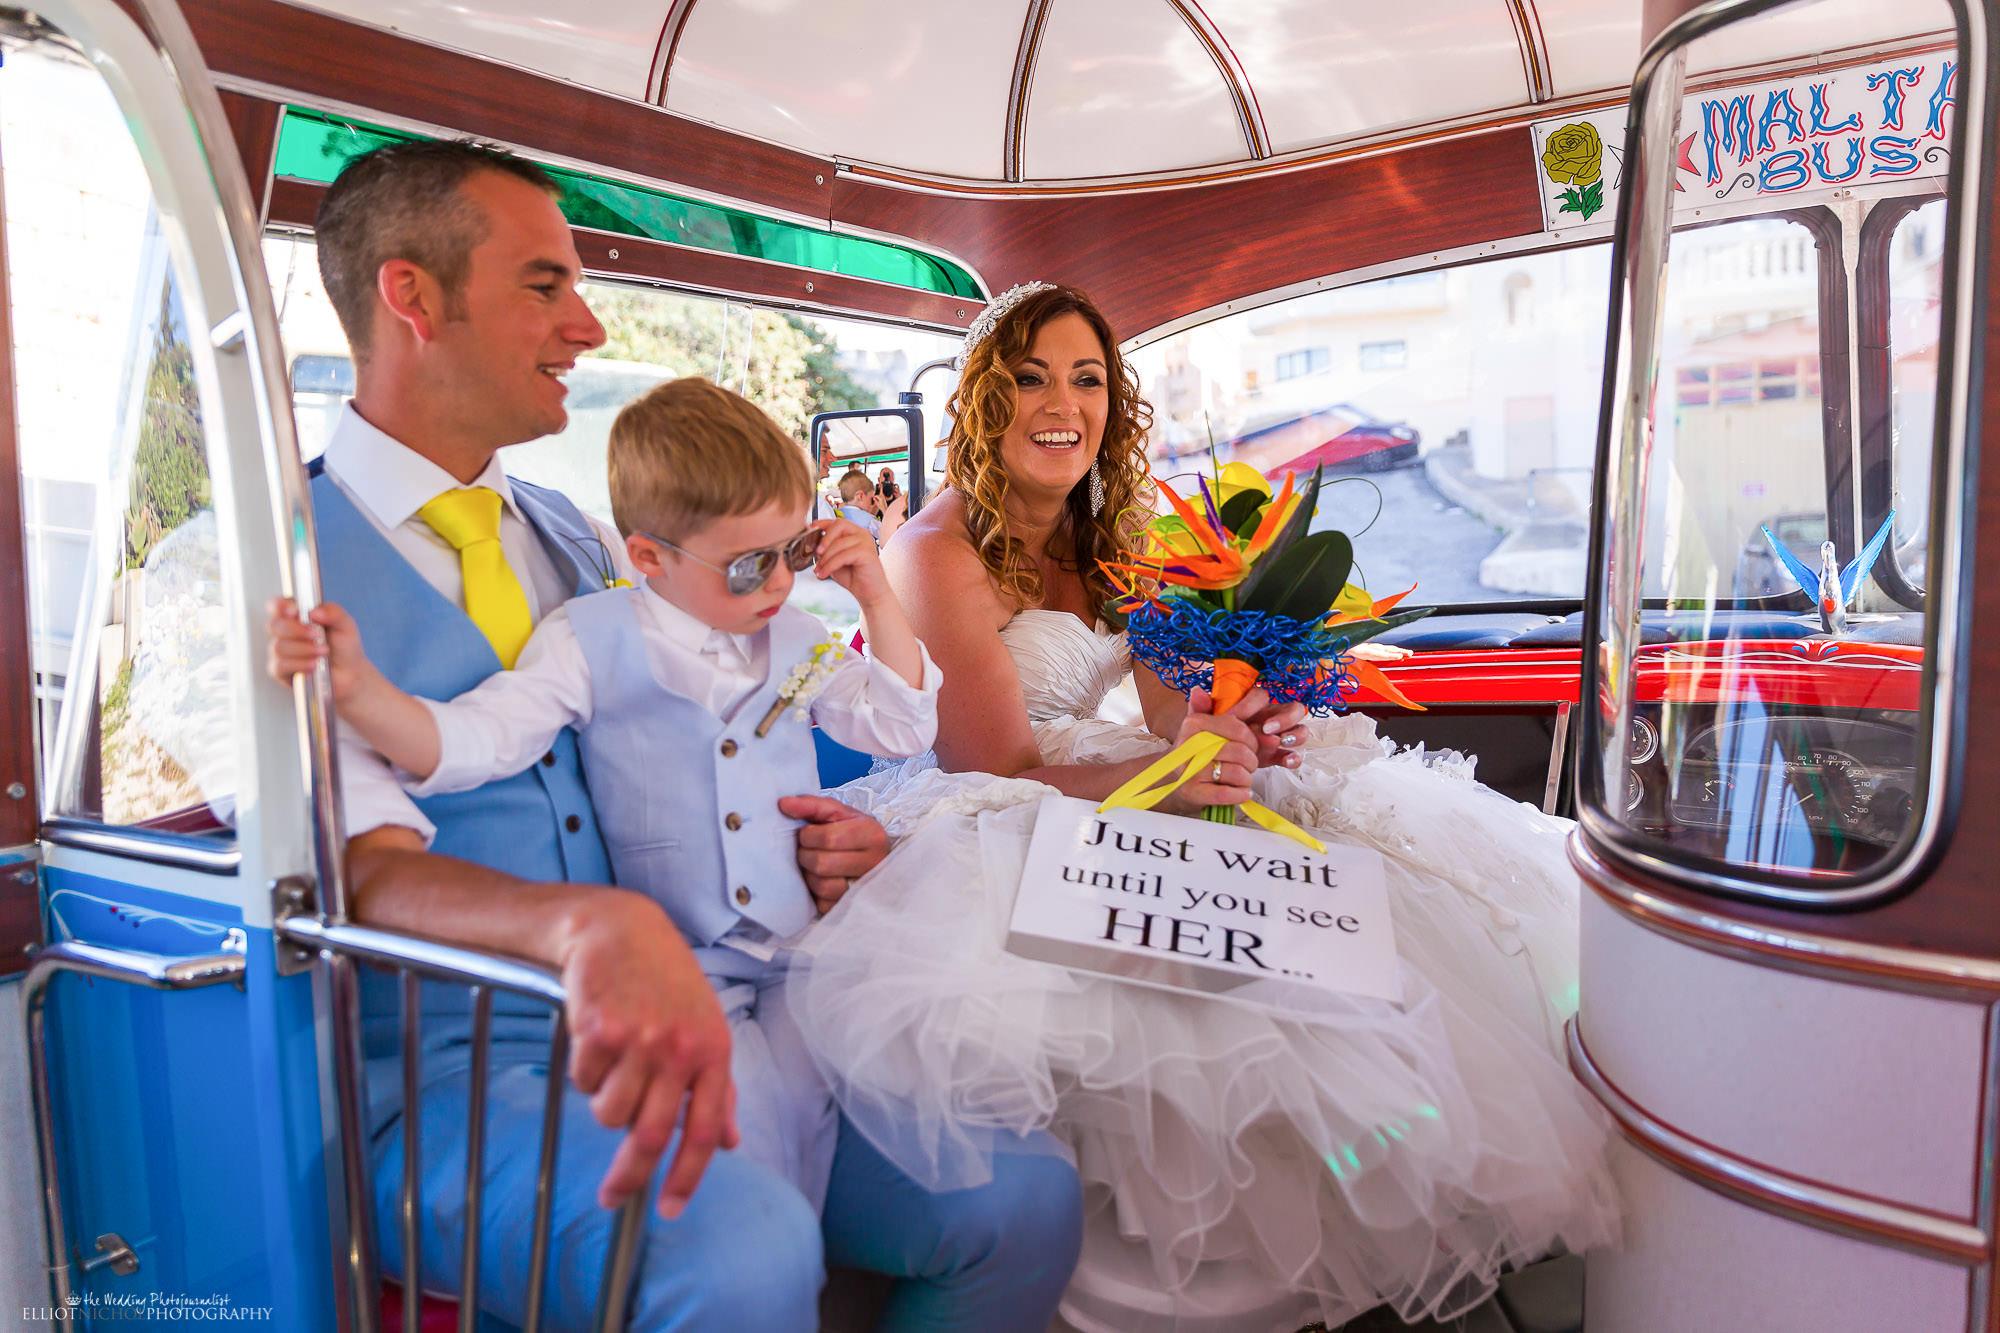 wedding-bus-ride-transport-Malta-photography